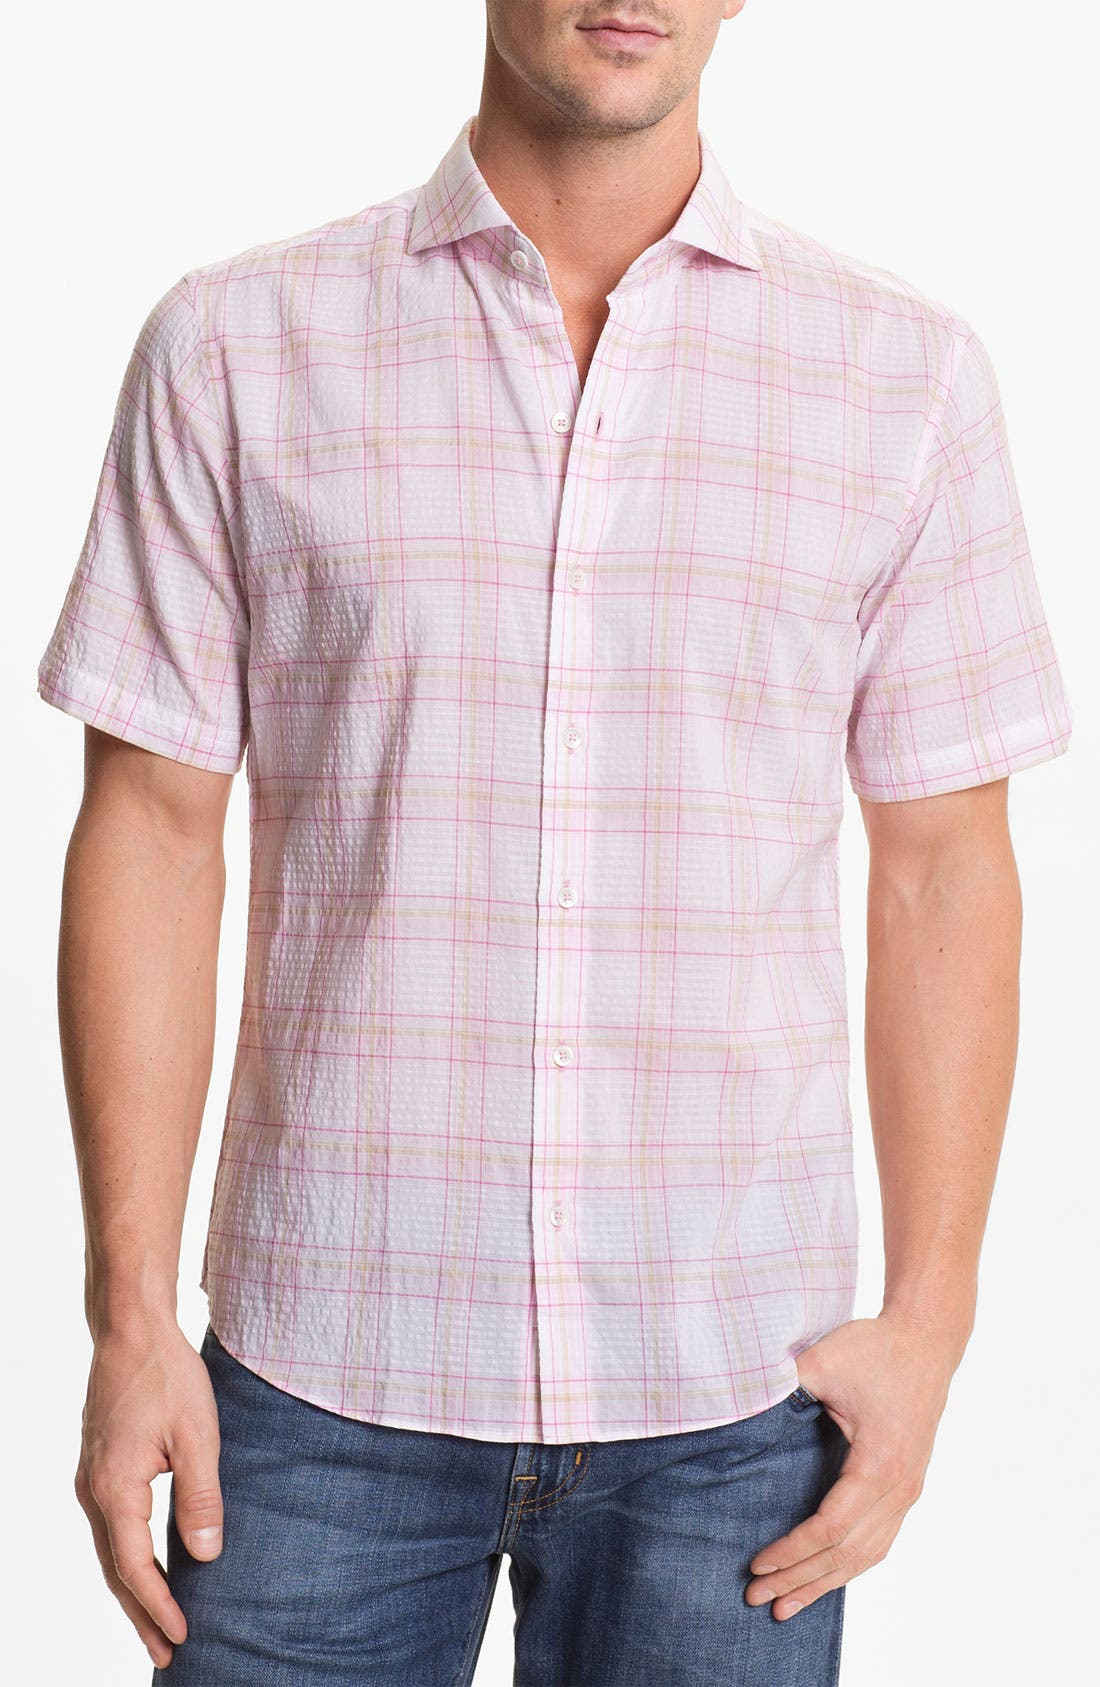 Alternate Image 1 Selected - Zachary Prell 'Reekie' Sport Shirt